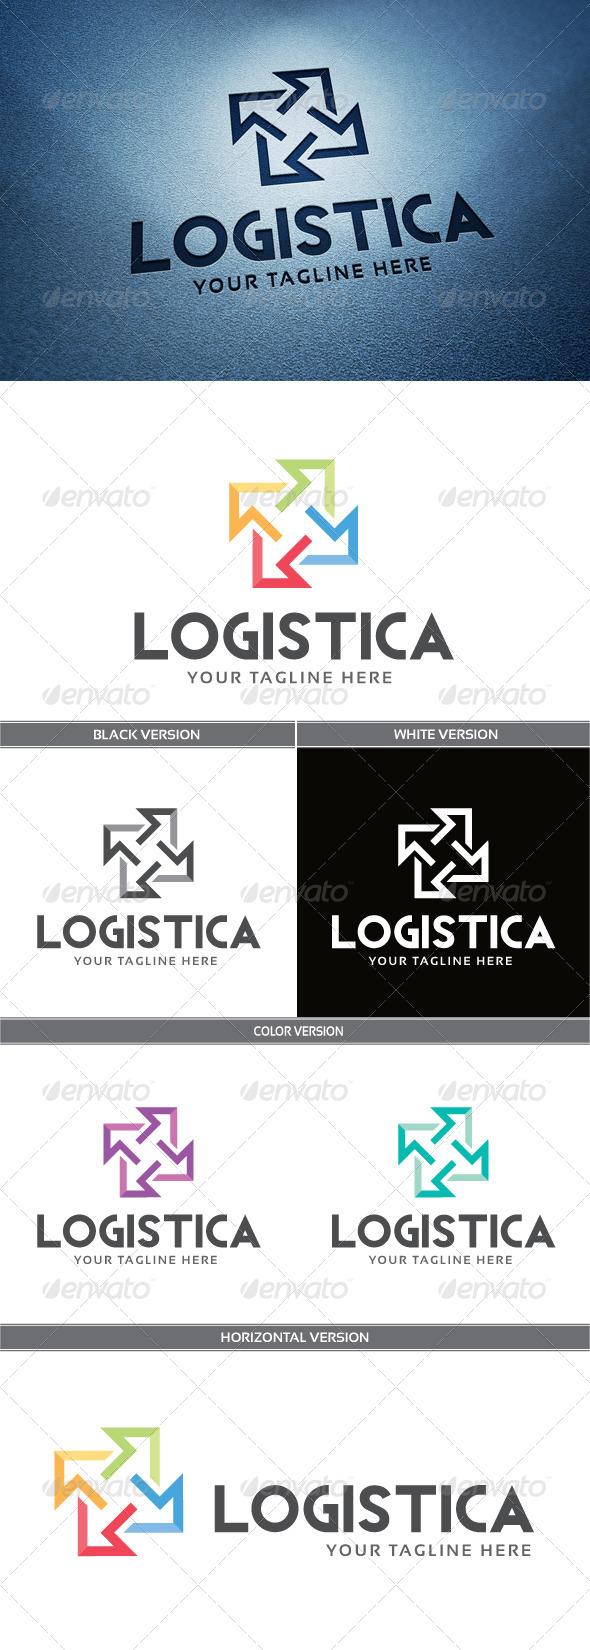 GraphicRiver Logistica 6602376